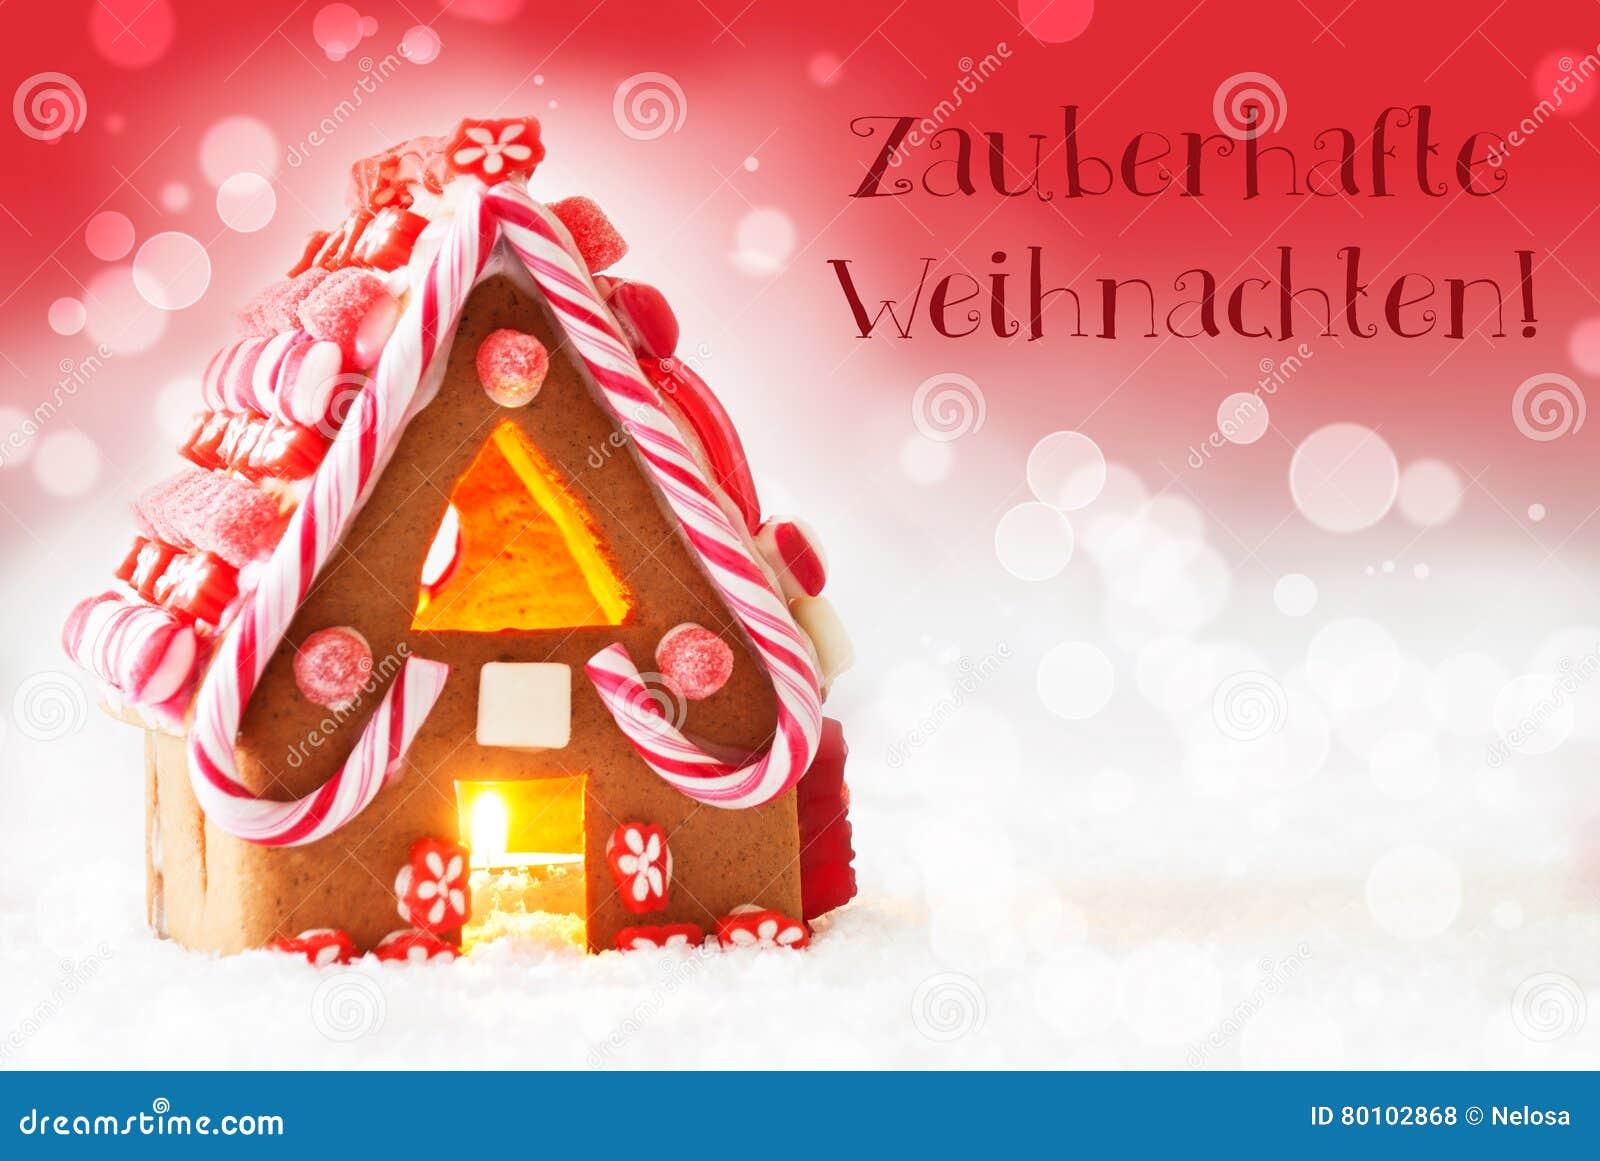 A casa, fundo vermelho, texto Zauberhafte Weihnachten significa o Natal mágico